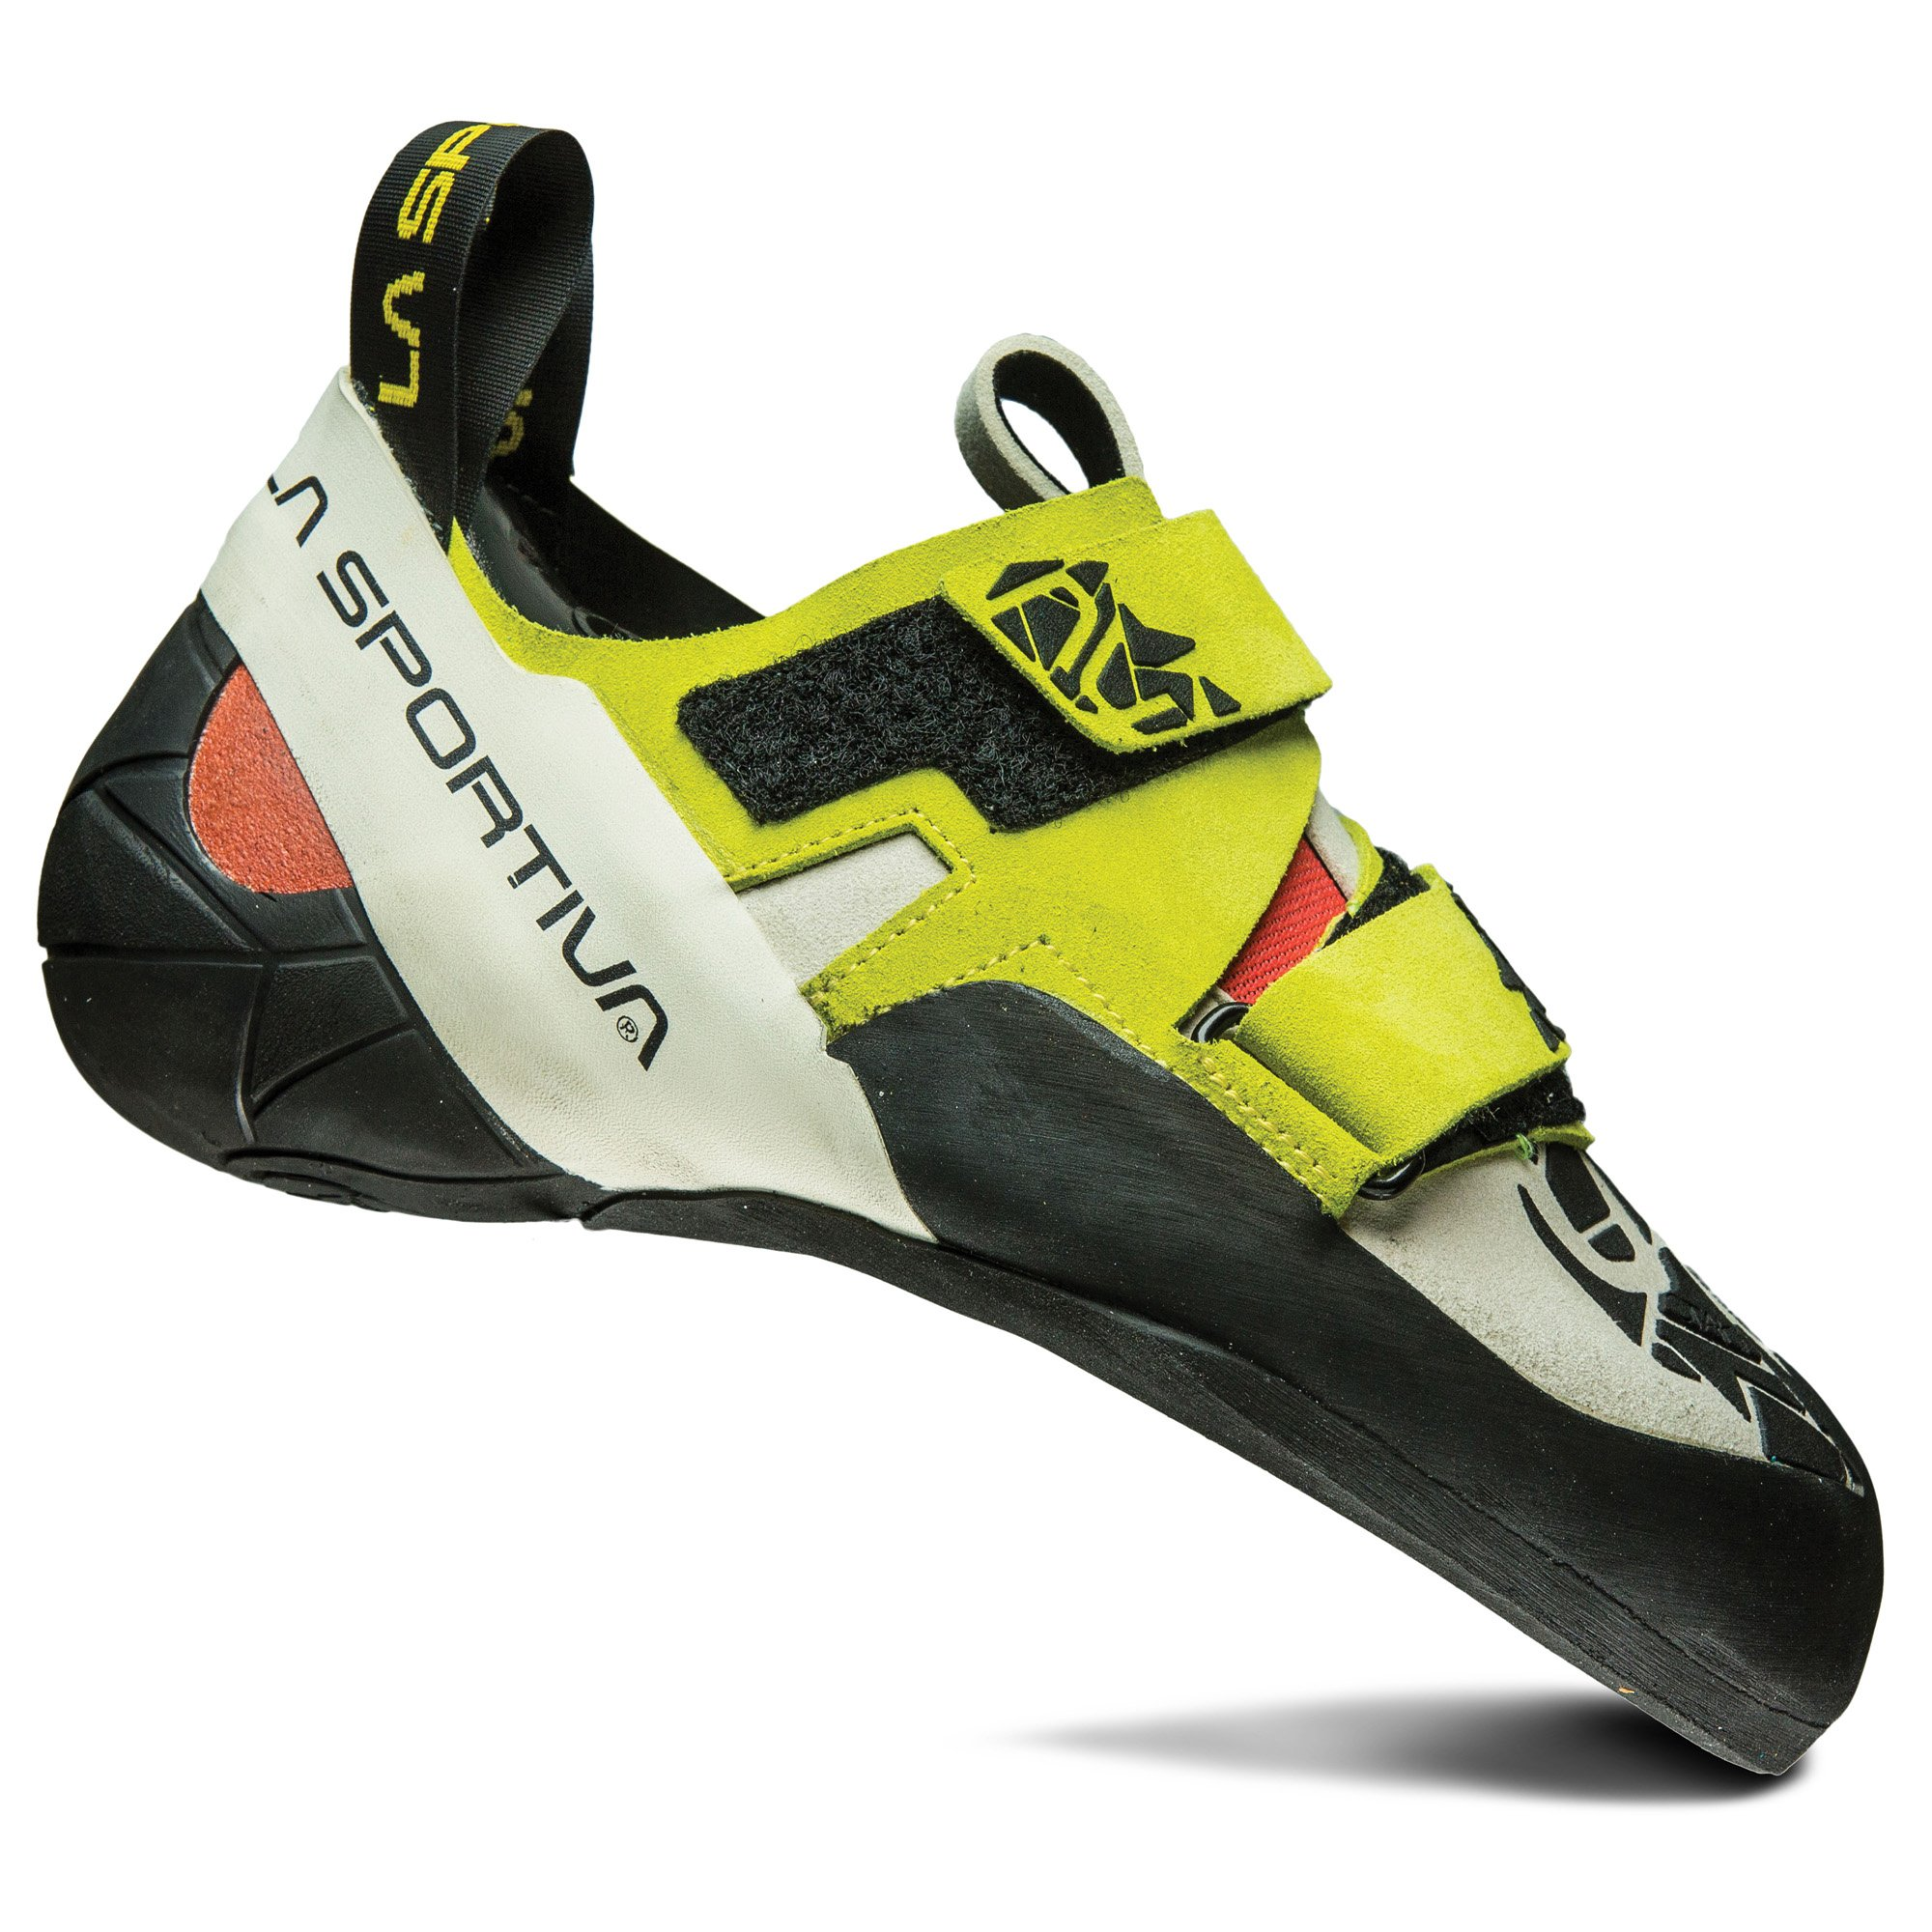 La Sportiva Otaki Climbing Shoe - Women's Sulphur / Coral 38.5